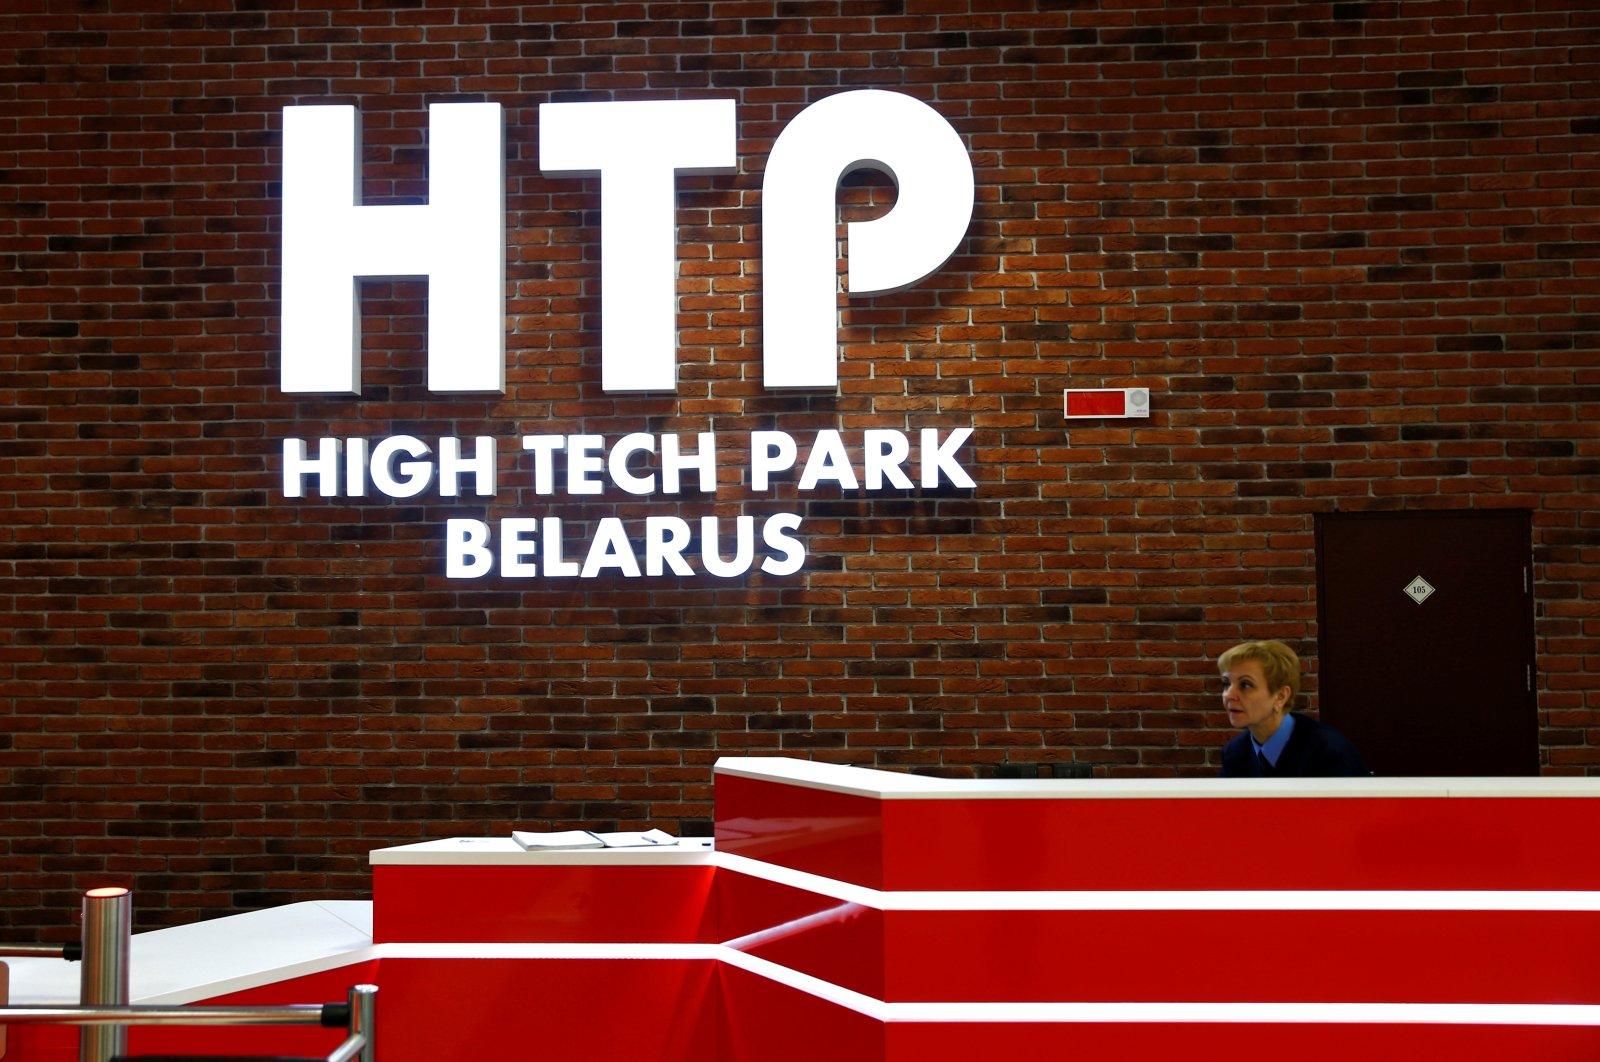 Logo of Hi-Tech Park Belarus is seen on a wall at its office in Minsk, Belarus on March 17, 2016. (Reuters Photo)